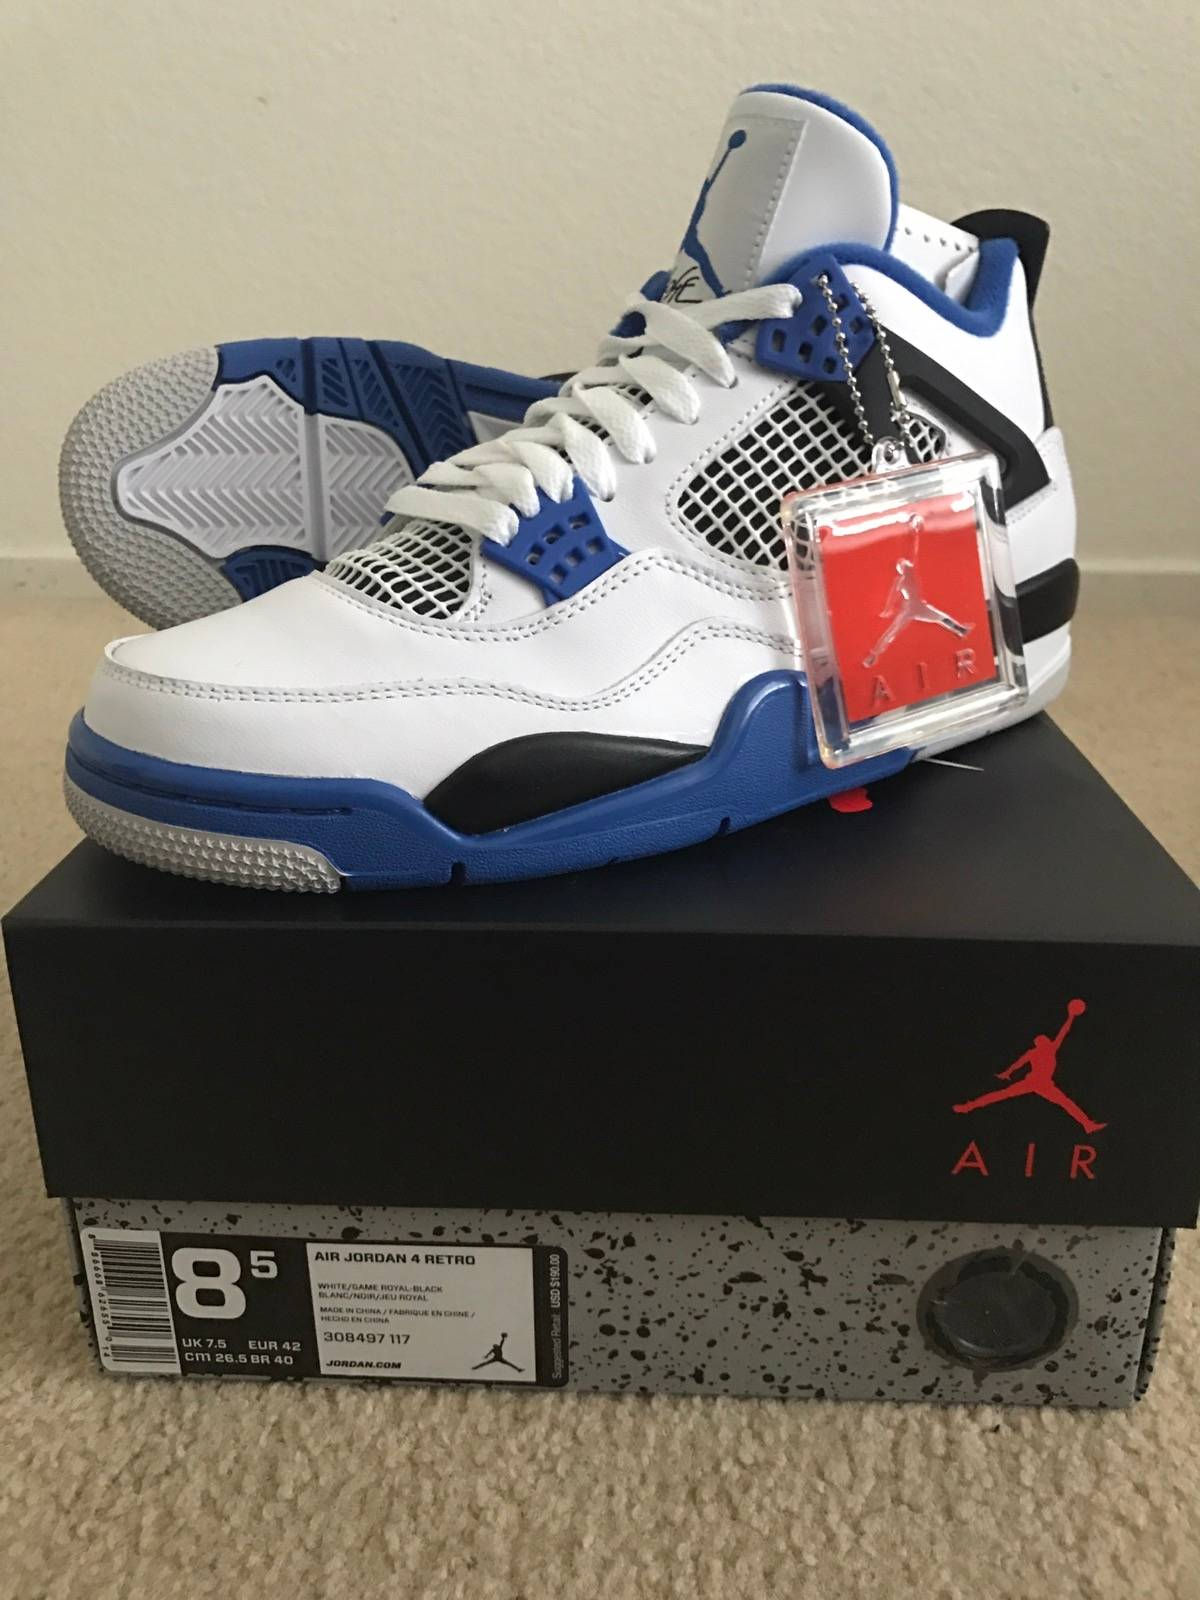 e5a6b4448901 Jordan Brand Jordan Motorsport 4s Size 8.5 - Hi-Top Sneakers for Sale -  Grailed